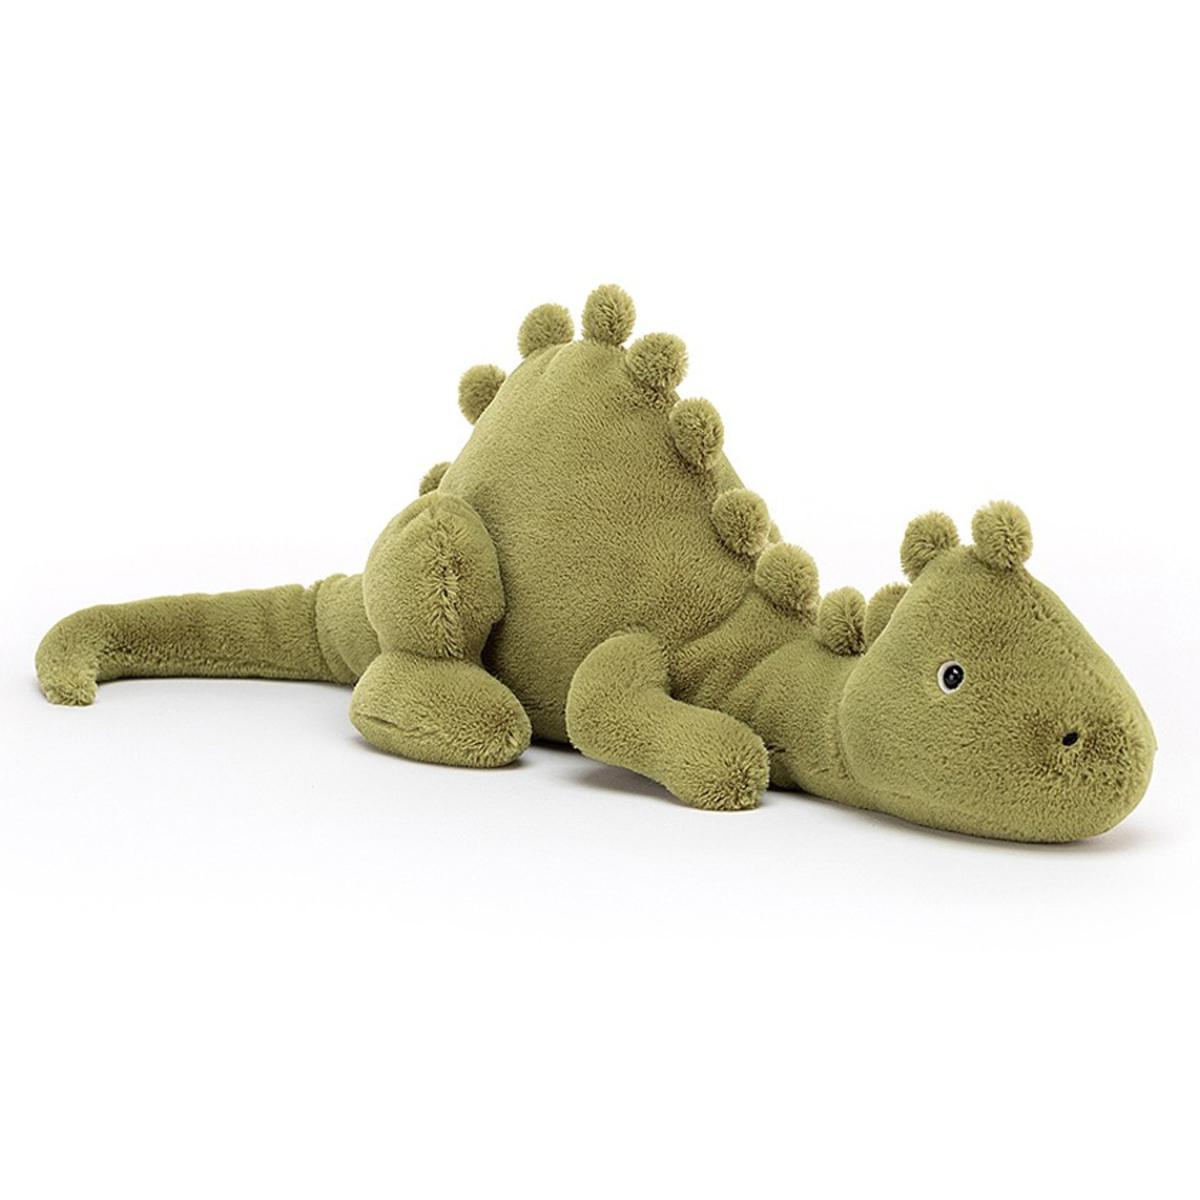 Peluche Vividie Dino Peluche Dinosaure 42 cm